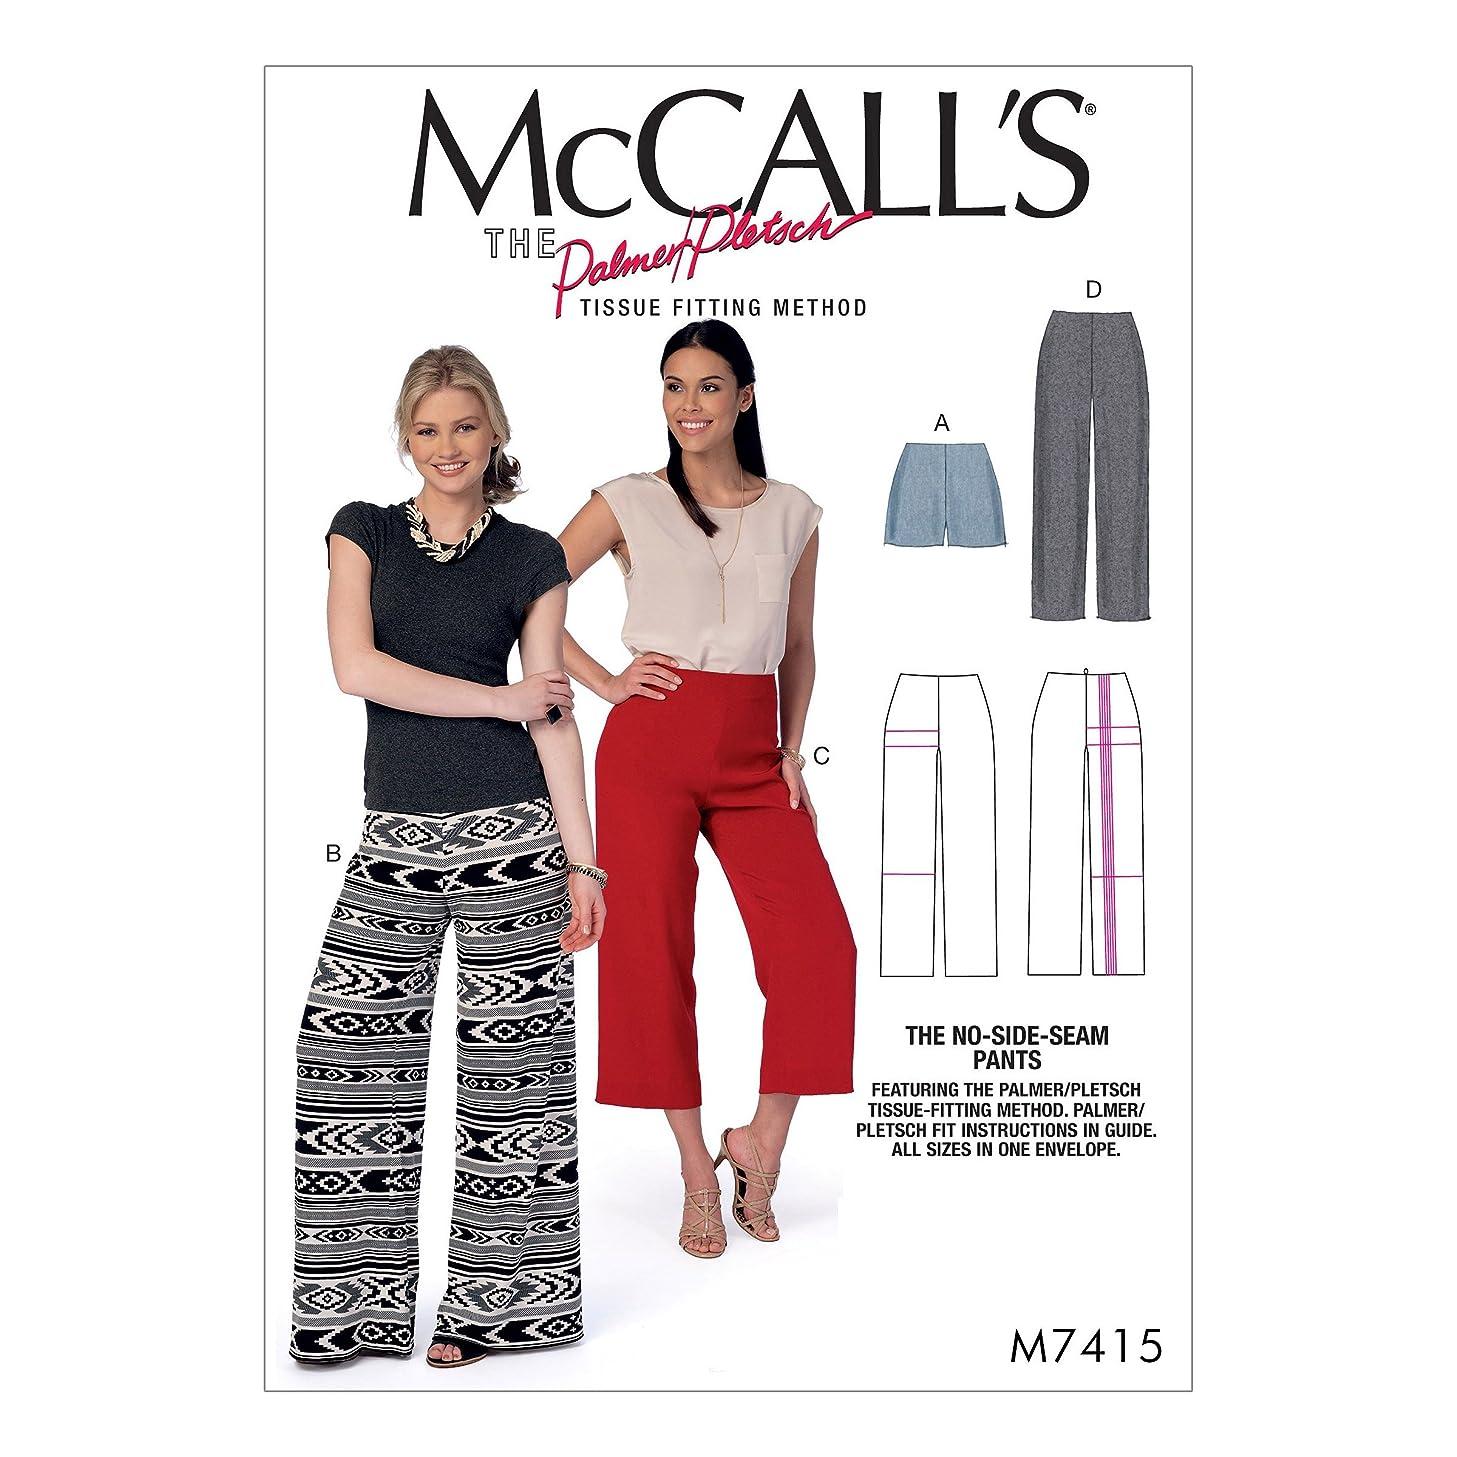 McCall's Patterns M7415OSZ Shorts & Pants Sewing Pattern